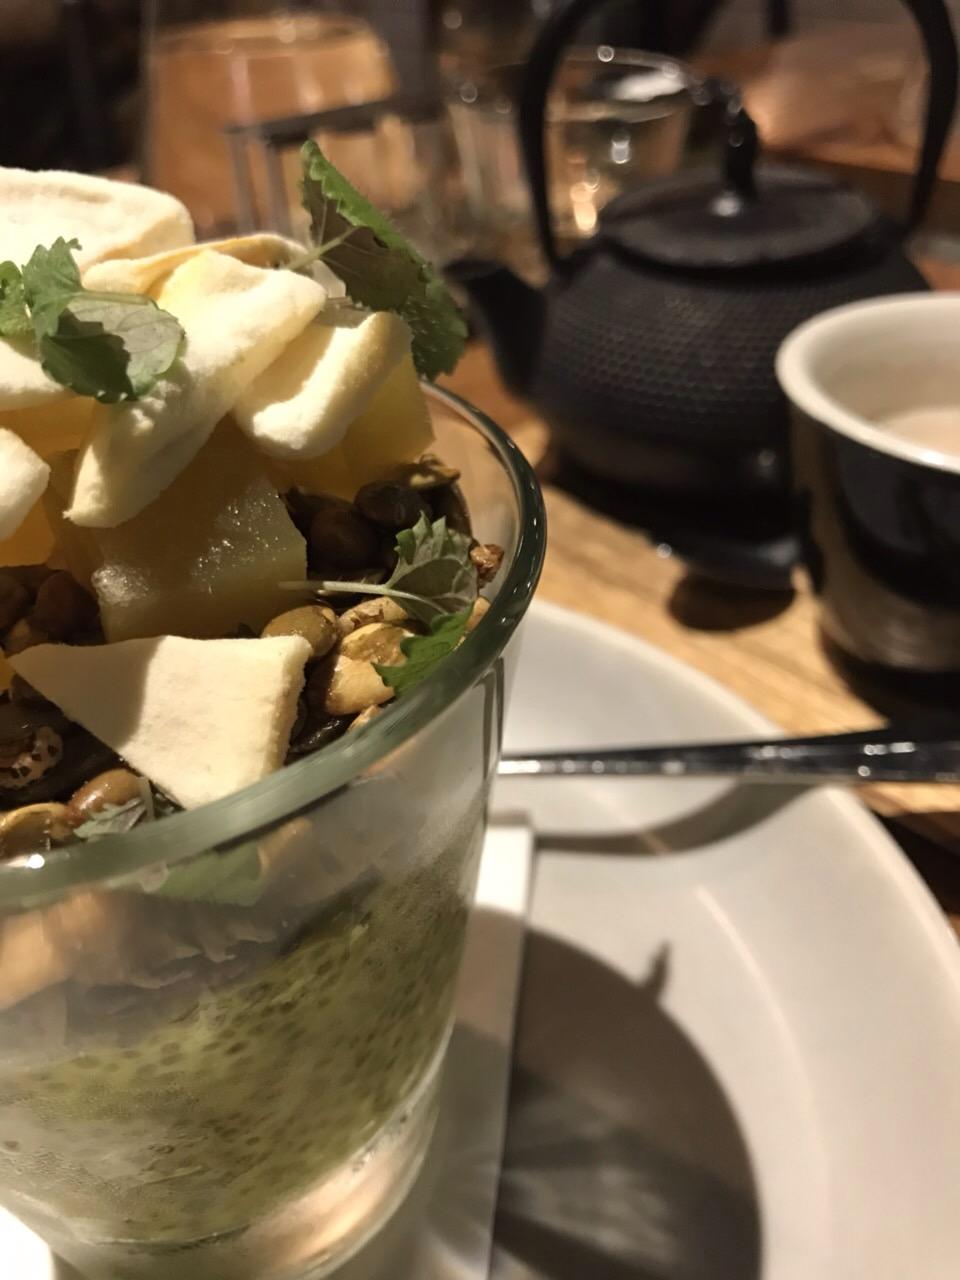 My glamorous chia pudding breakfast.